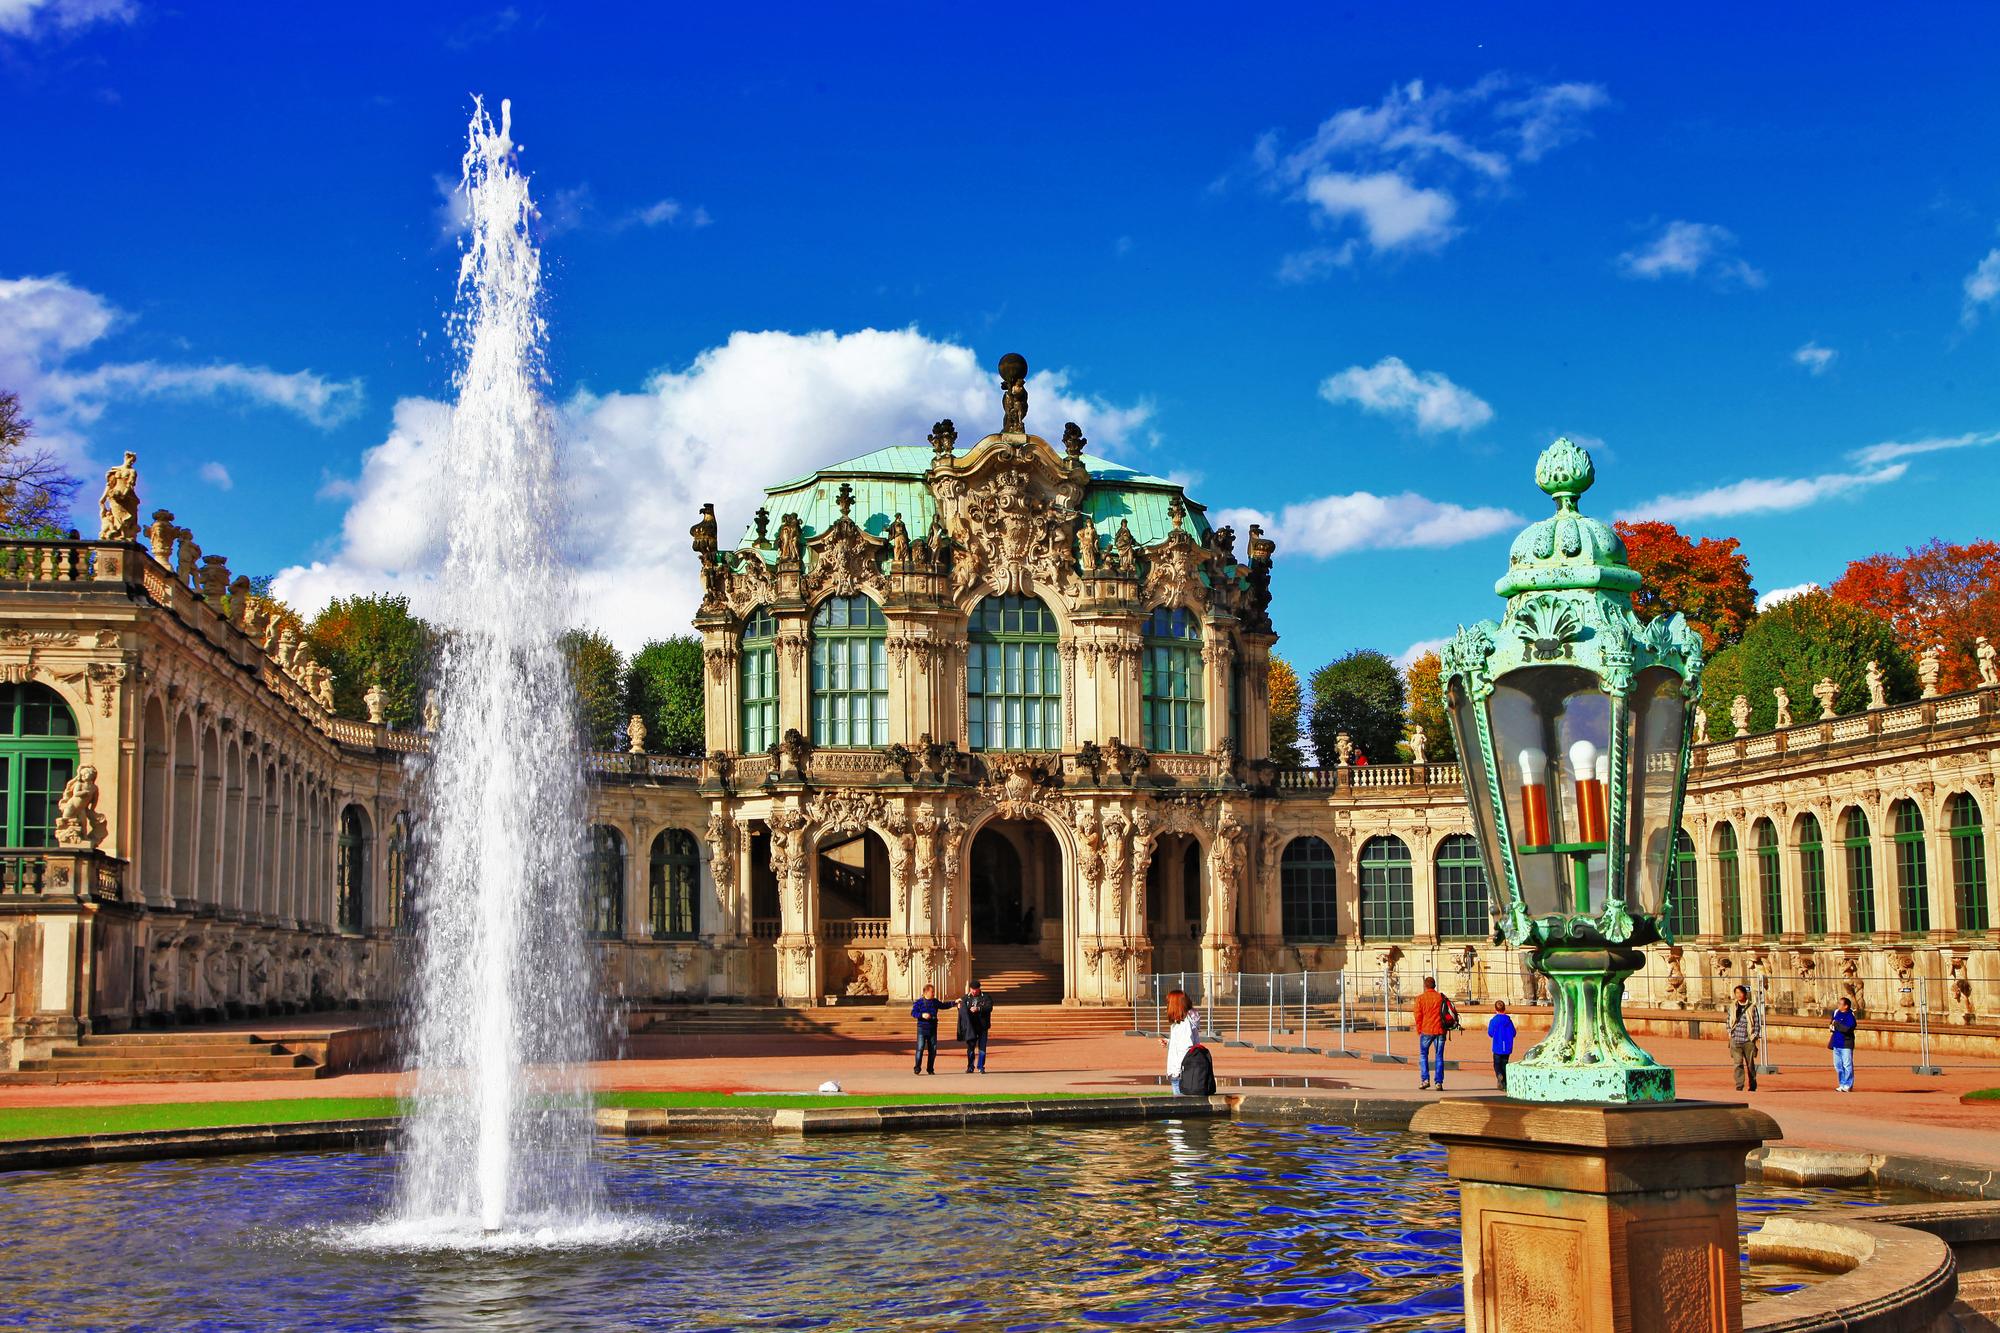 palace kaltenkirchen